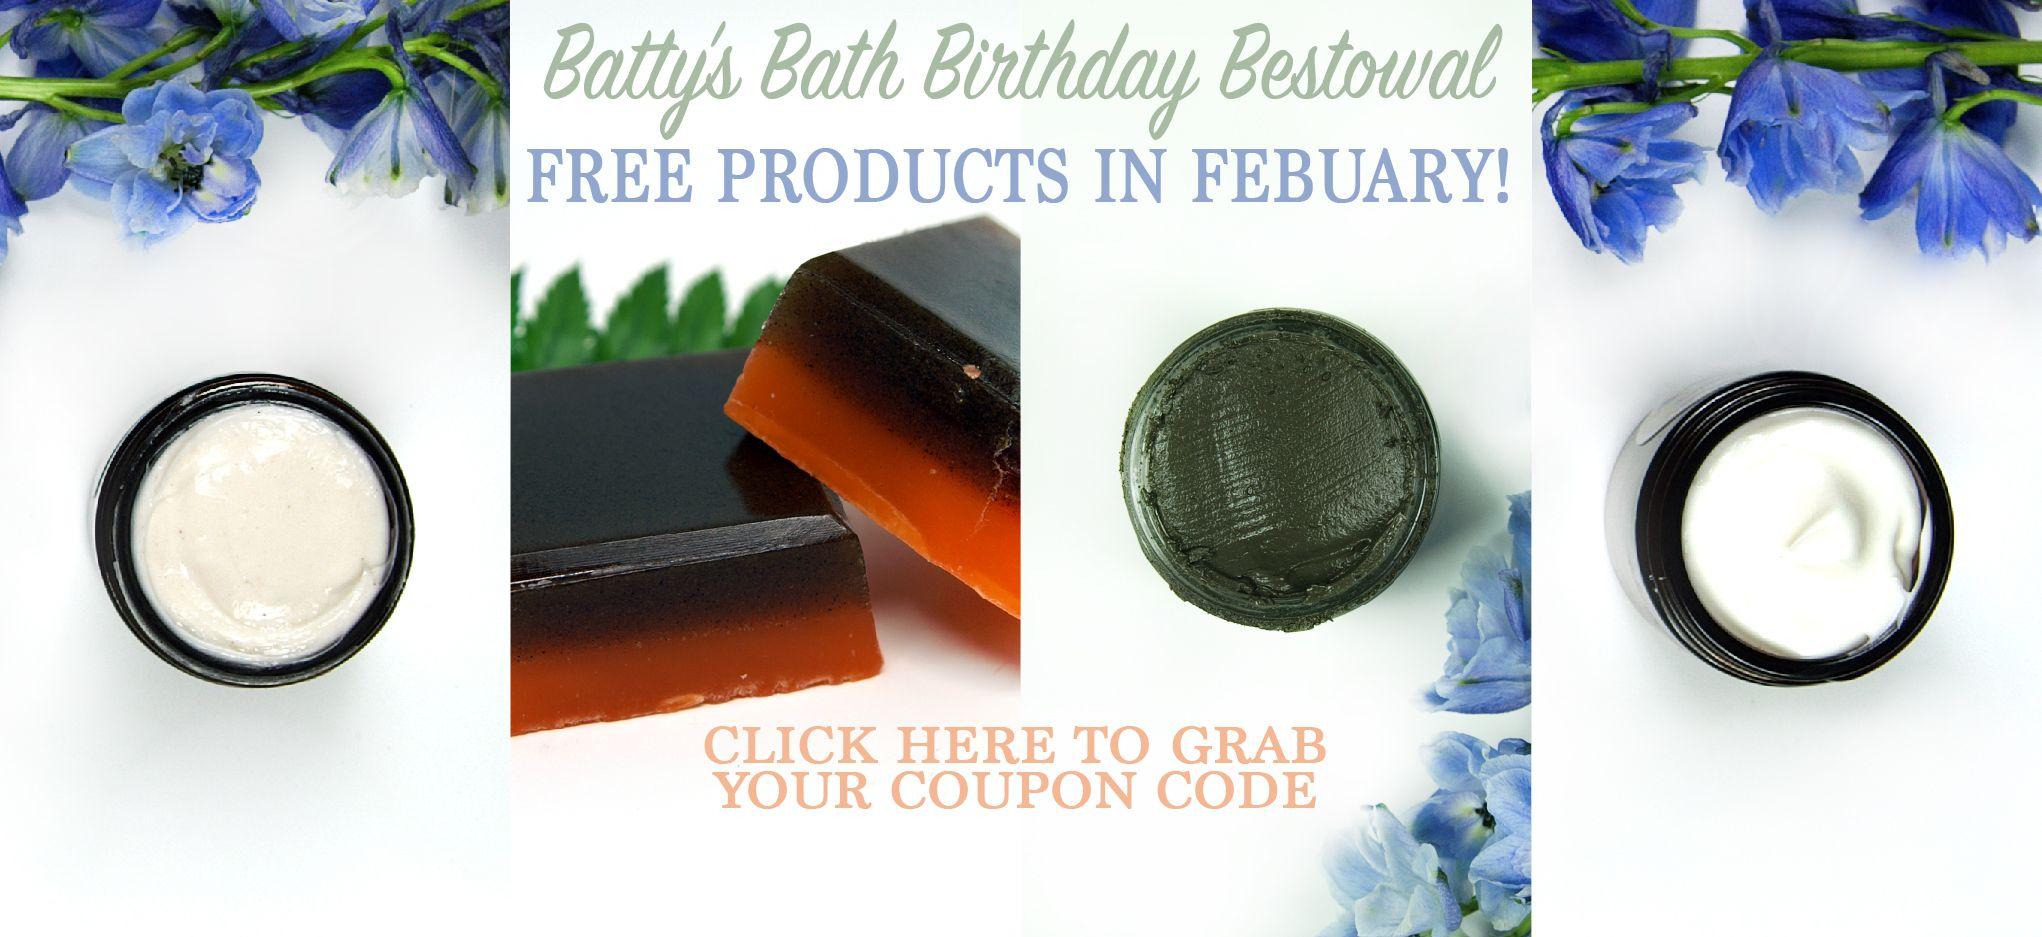 Batty's Bath Botanical Based Skin Care London, Ontario